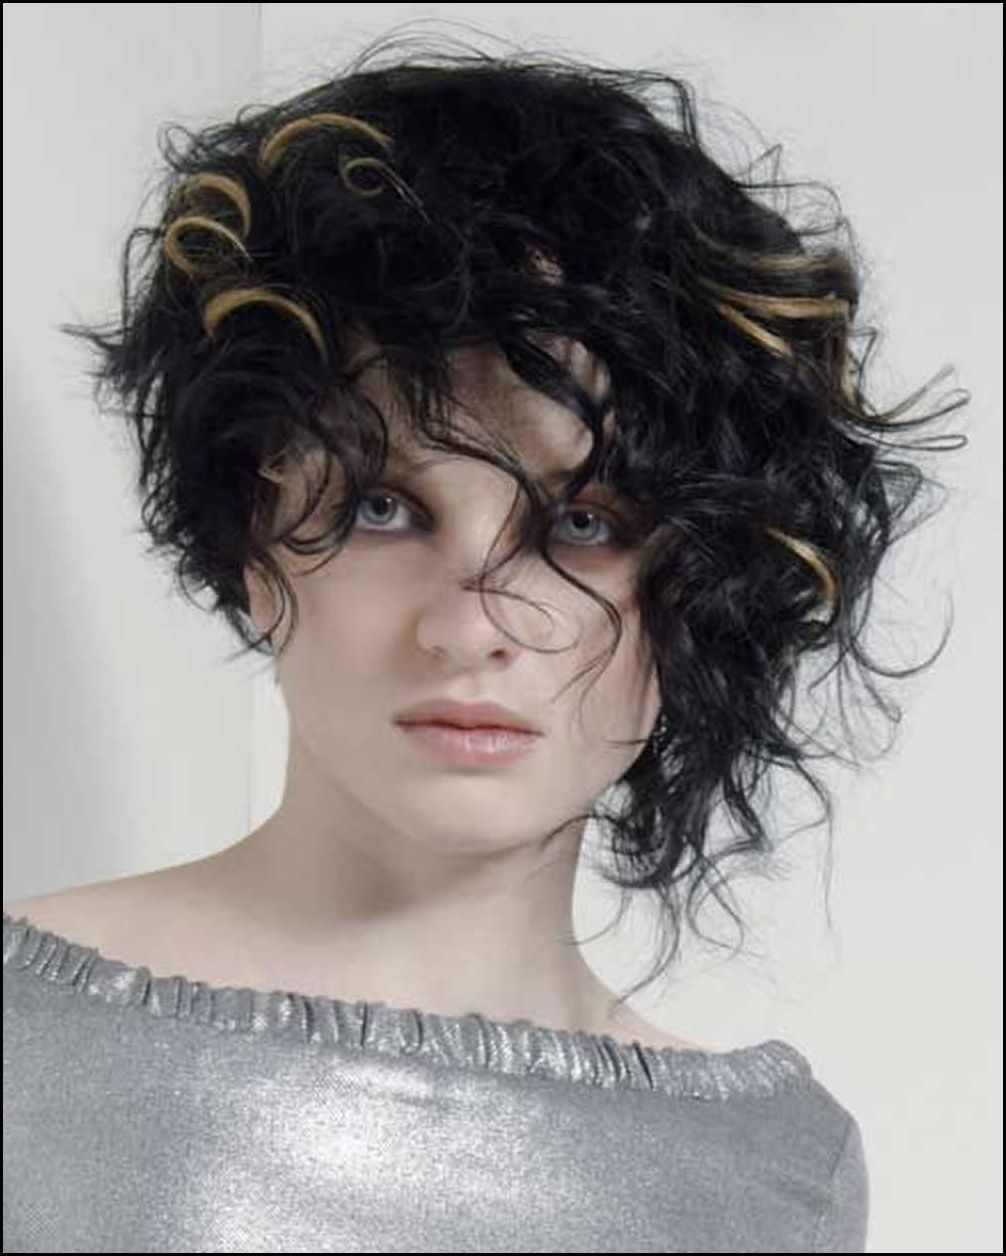 Asymmetrische Bob Haarschnitt Für Feines Haar 2018 2019 Curly Girl